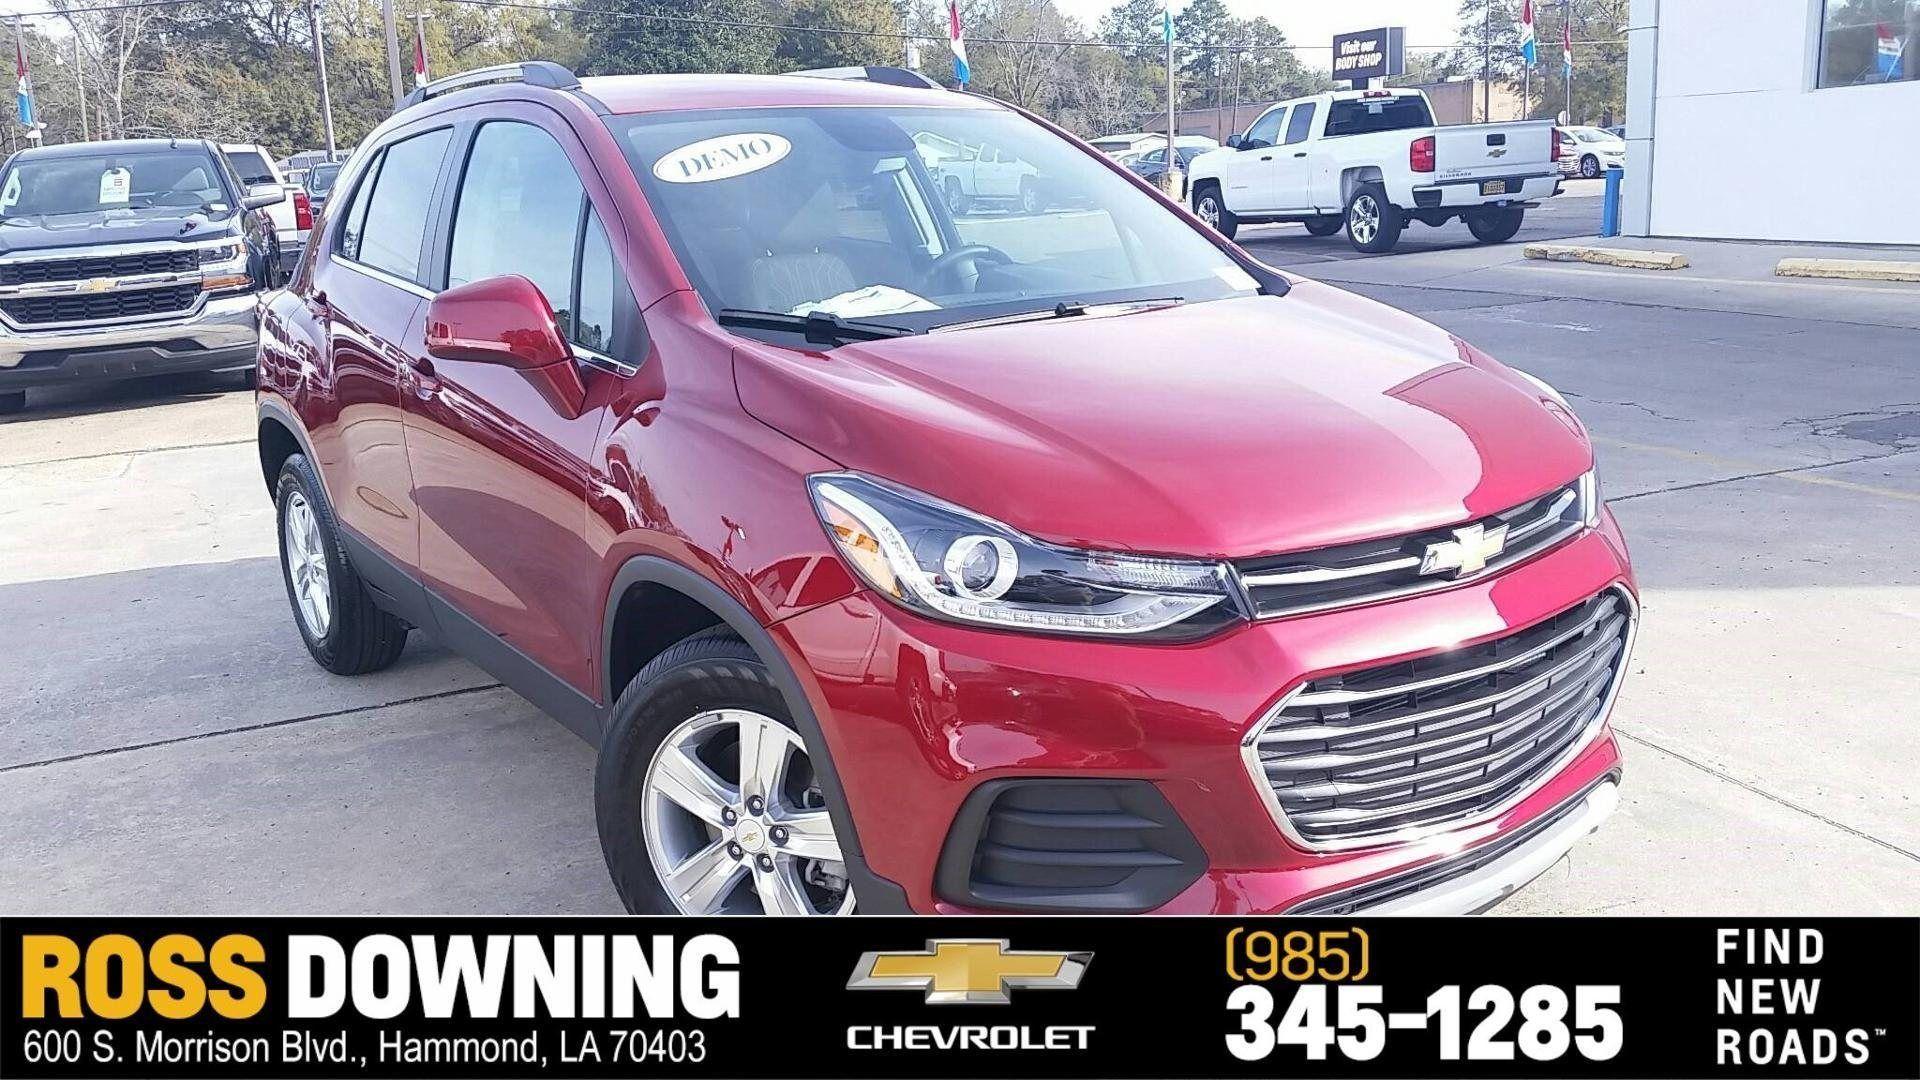 2020 Chevrolet Equinox Price In 2020 Chevrolet Equinox Chevrolet Toyota Dealers